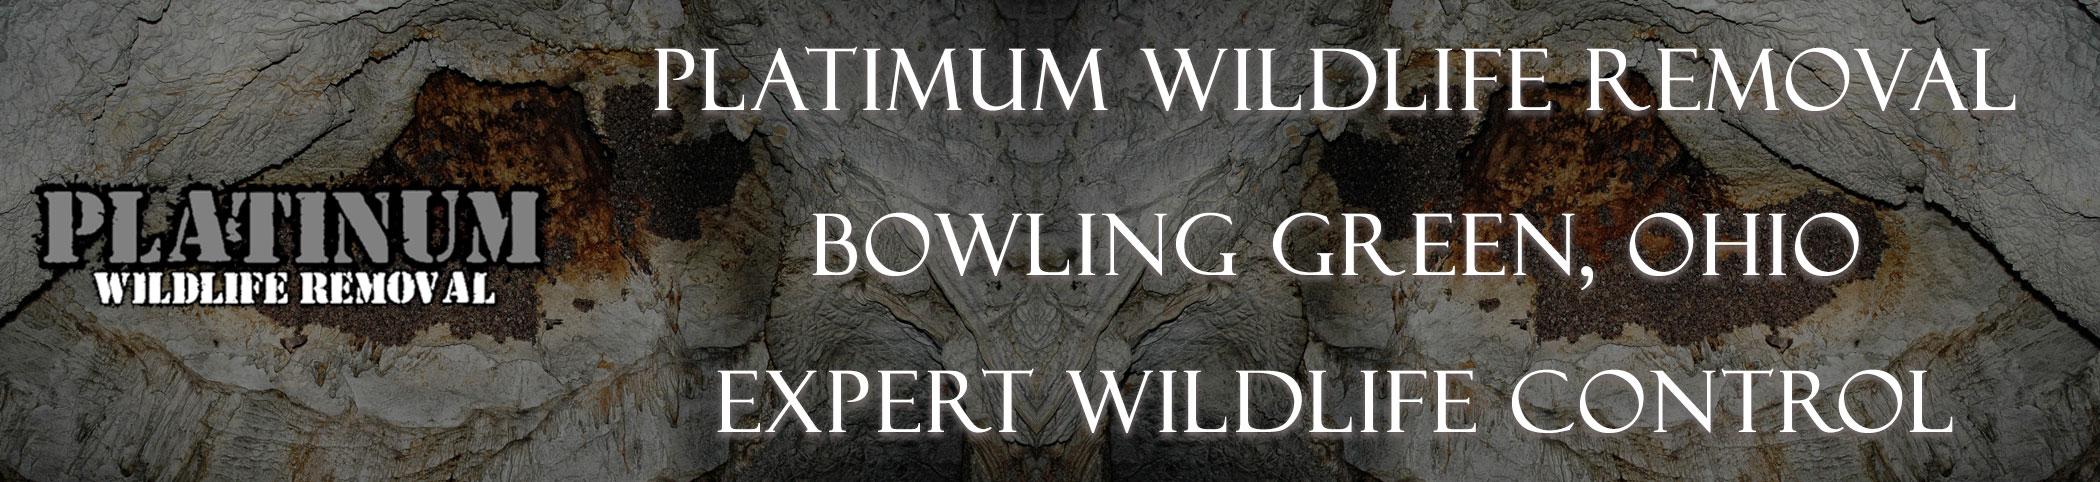 Platinum-Wildlife-Removal_bowling-green-ohio